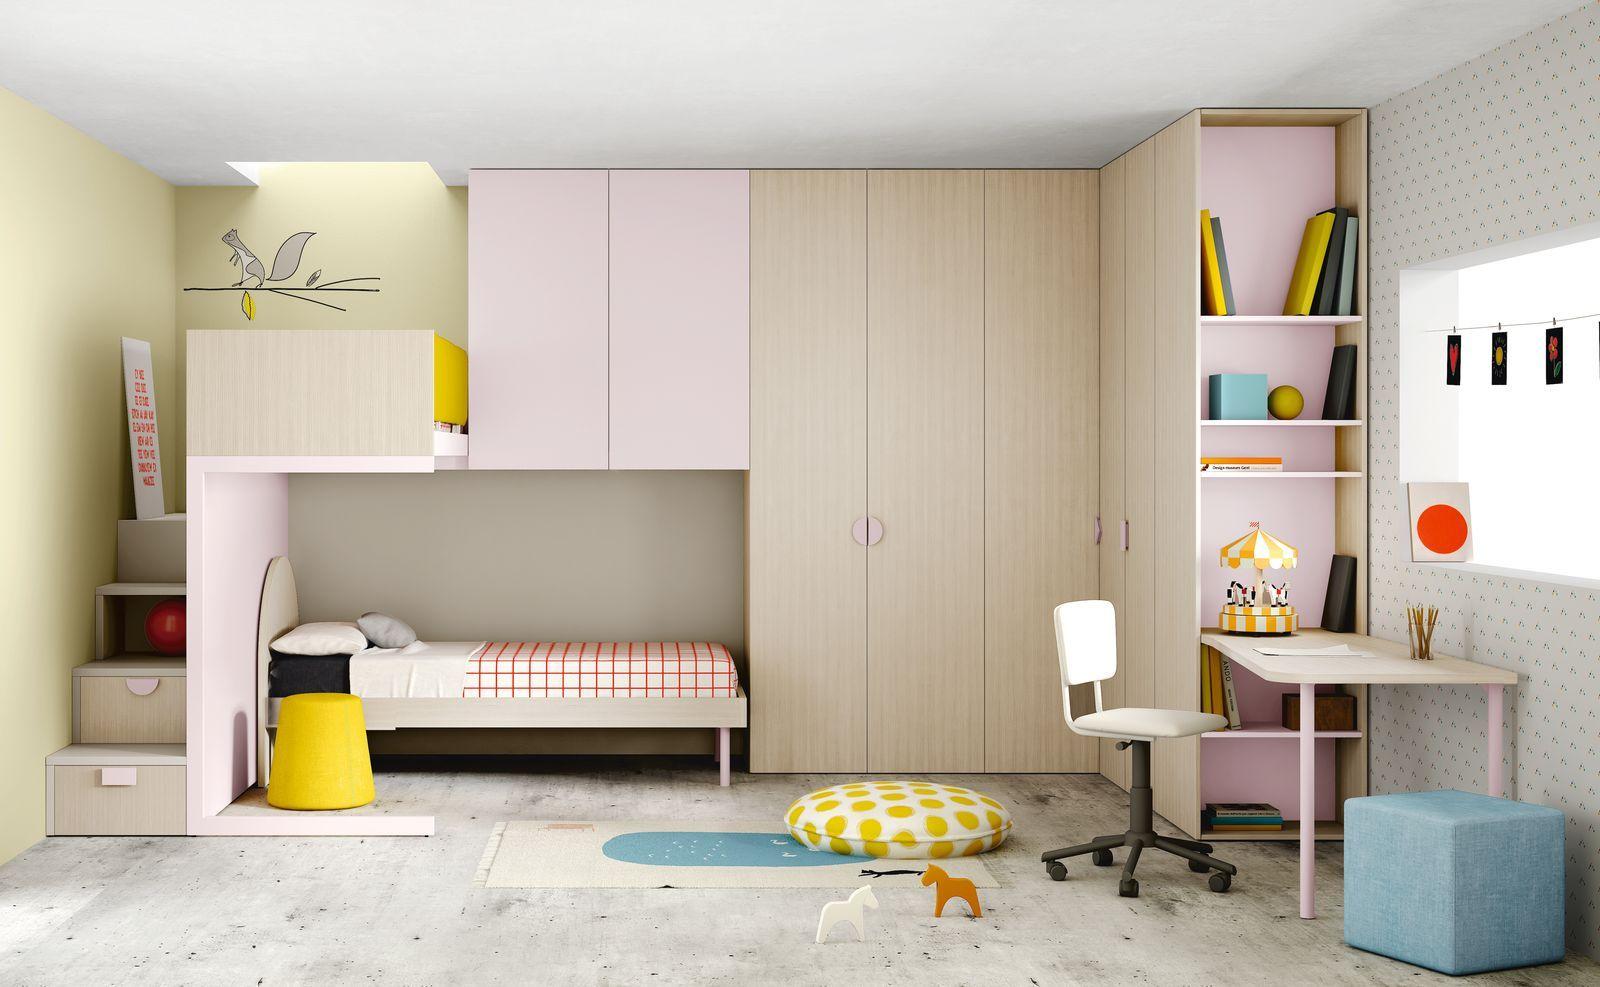 Camerette moderne soppalco Habitaciones infantiles